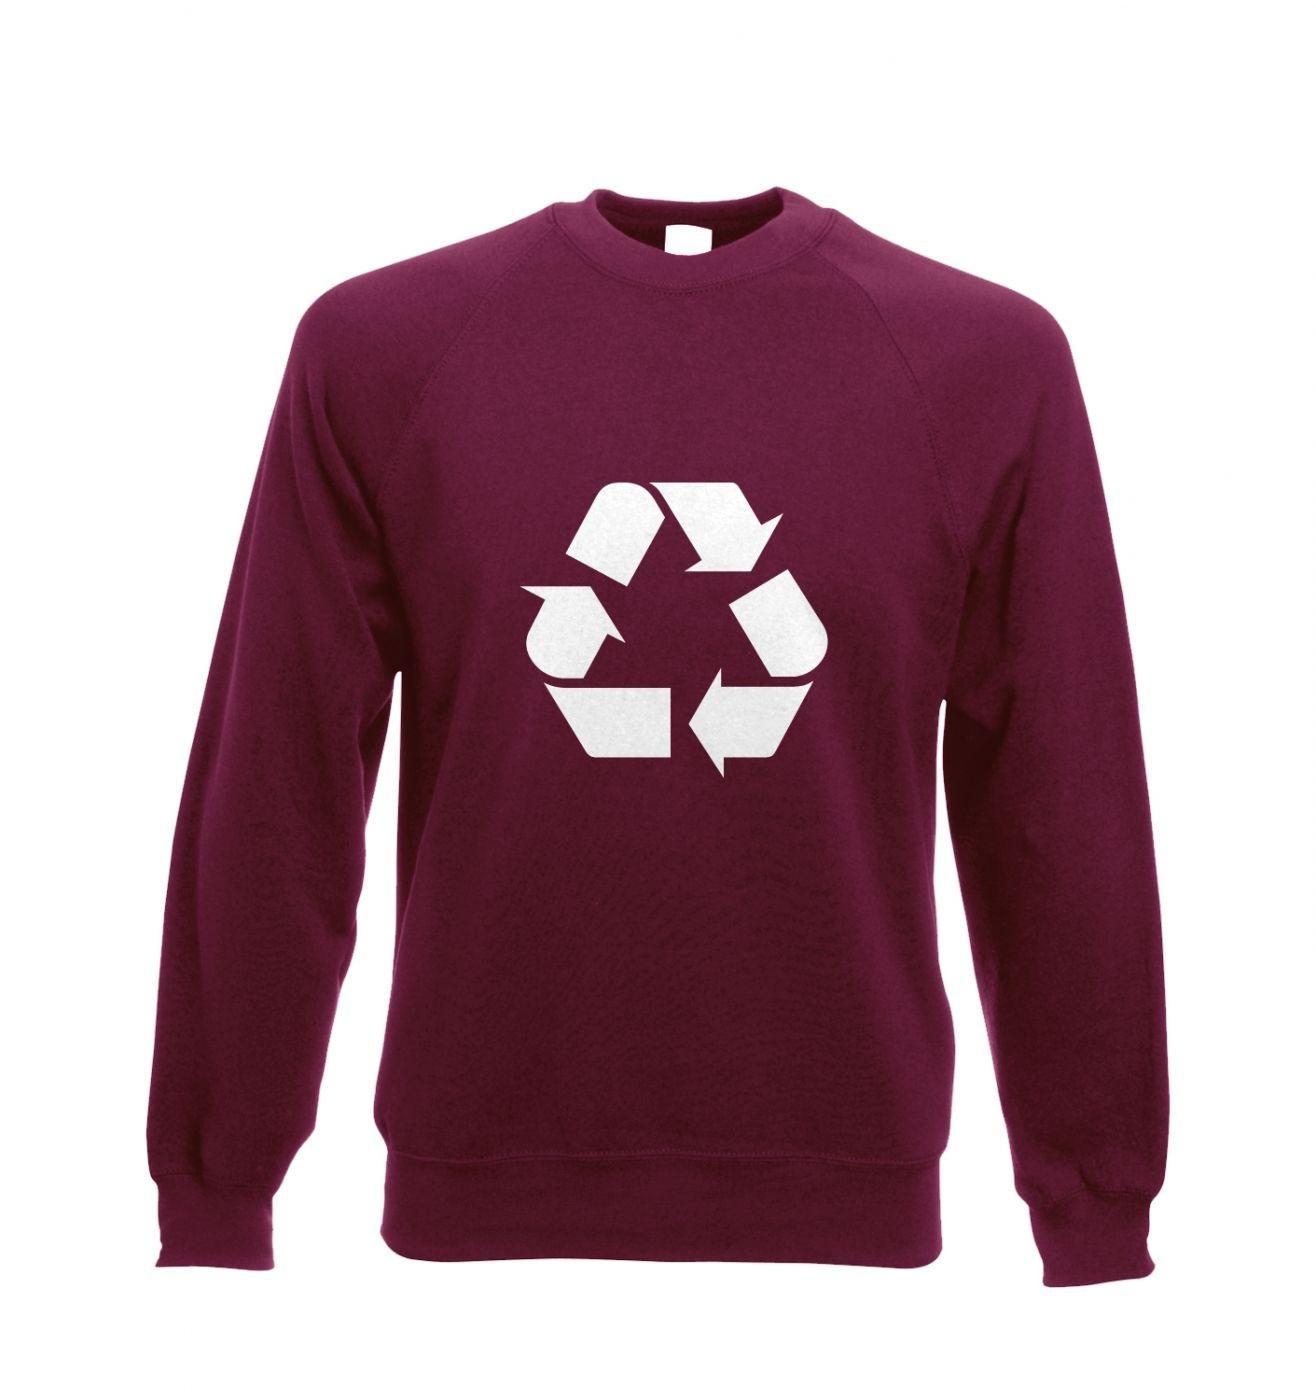 White Recycling Symbol Adult Crewneck Sweatshirt